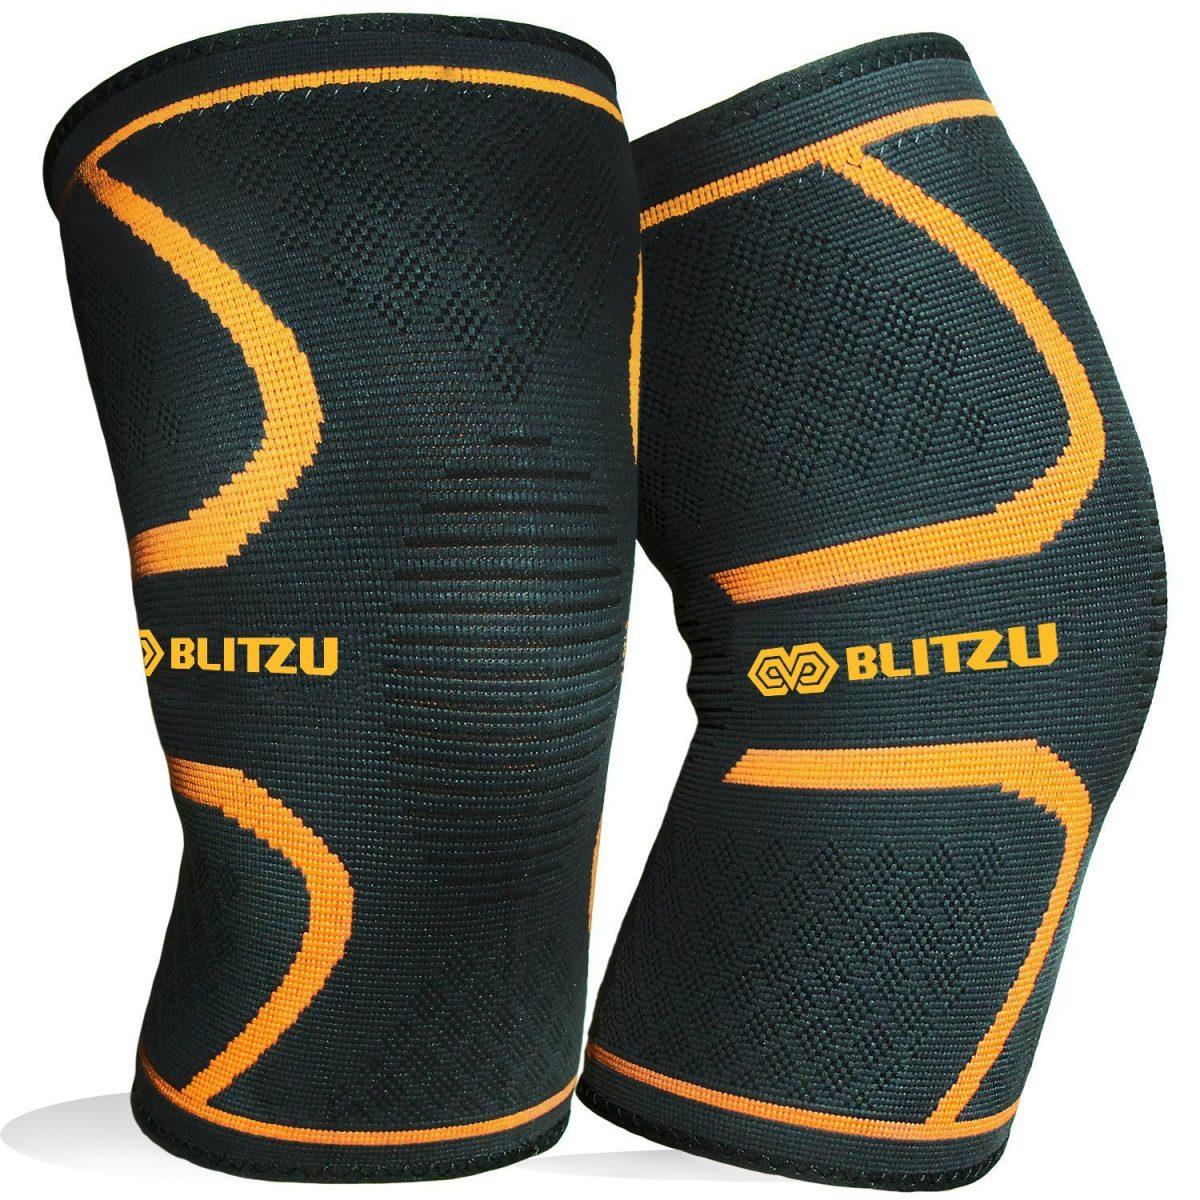 Blitzu Flex Plus Compression Knee Brace for Joint Pain – The Best Joint Pain Relief